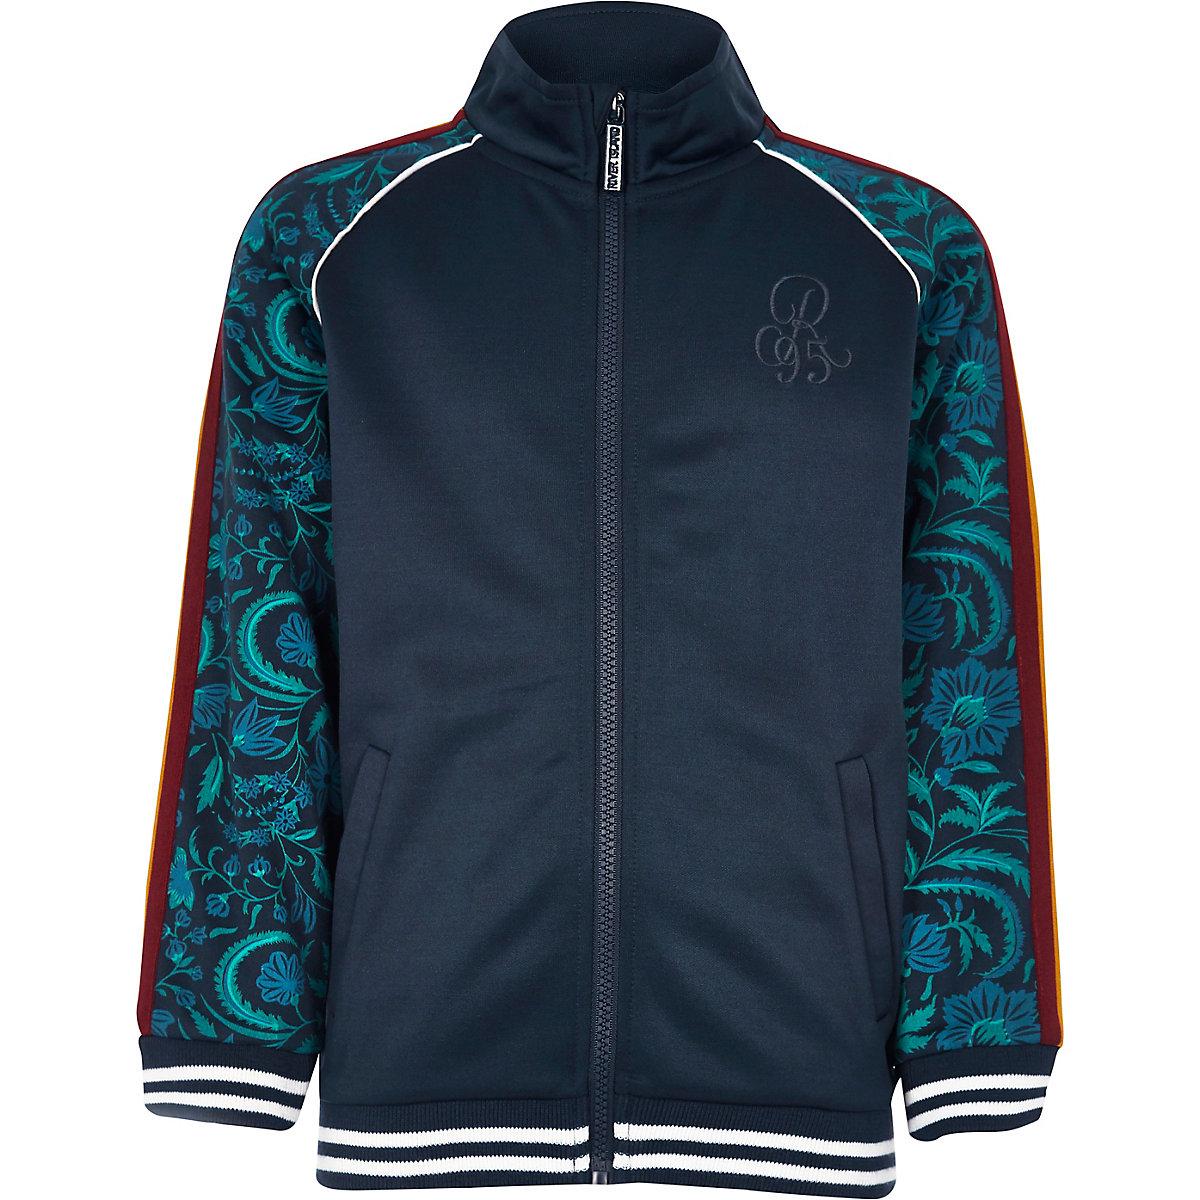 Boys navy floral printed track jacket